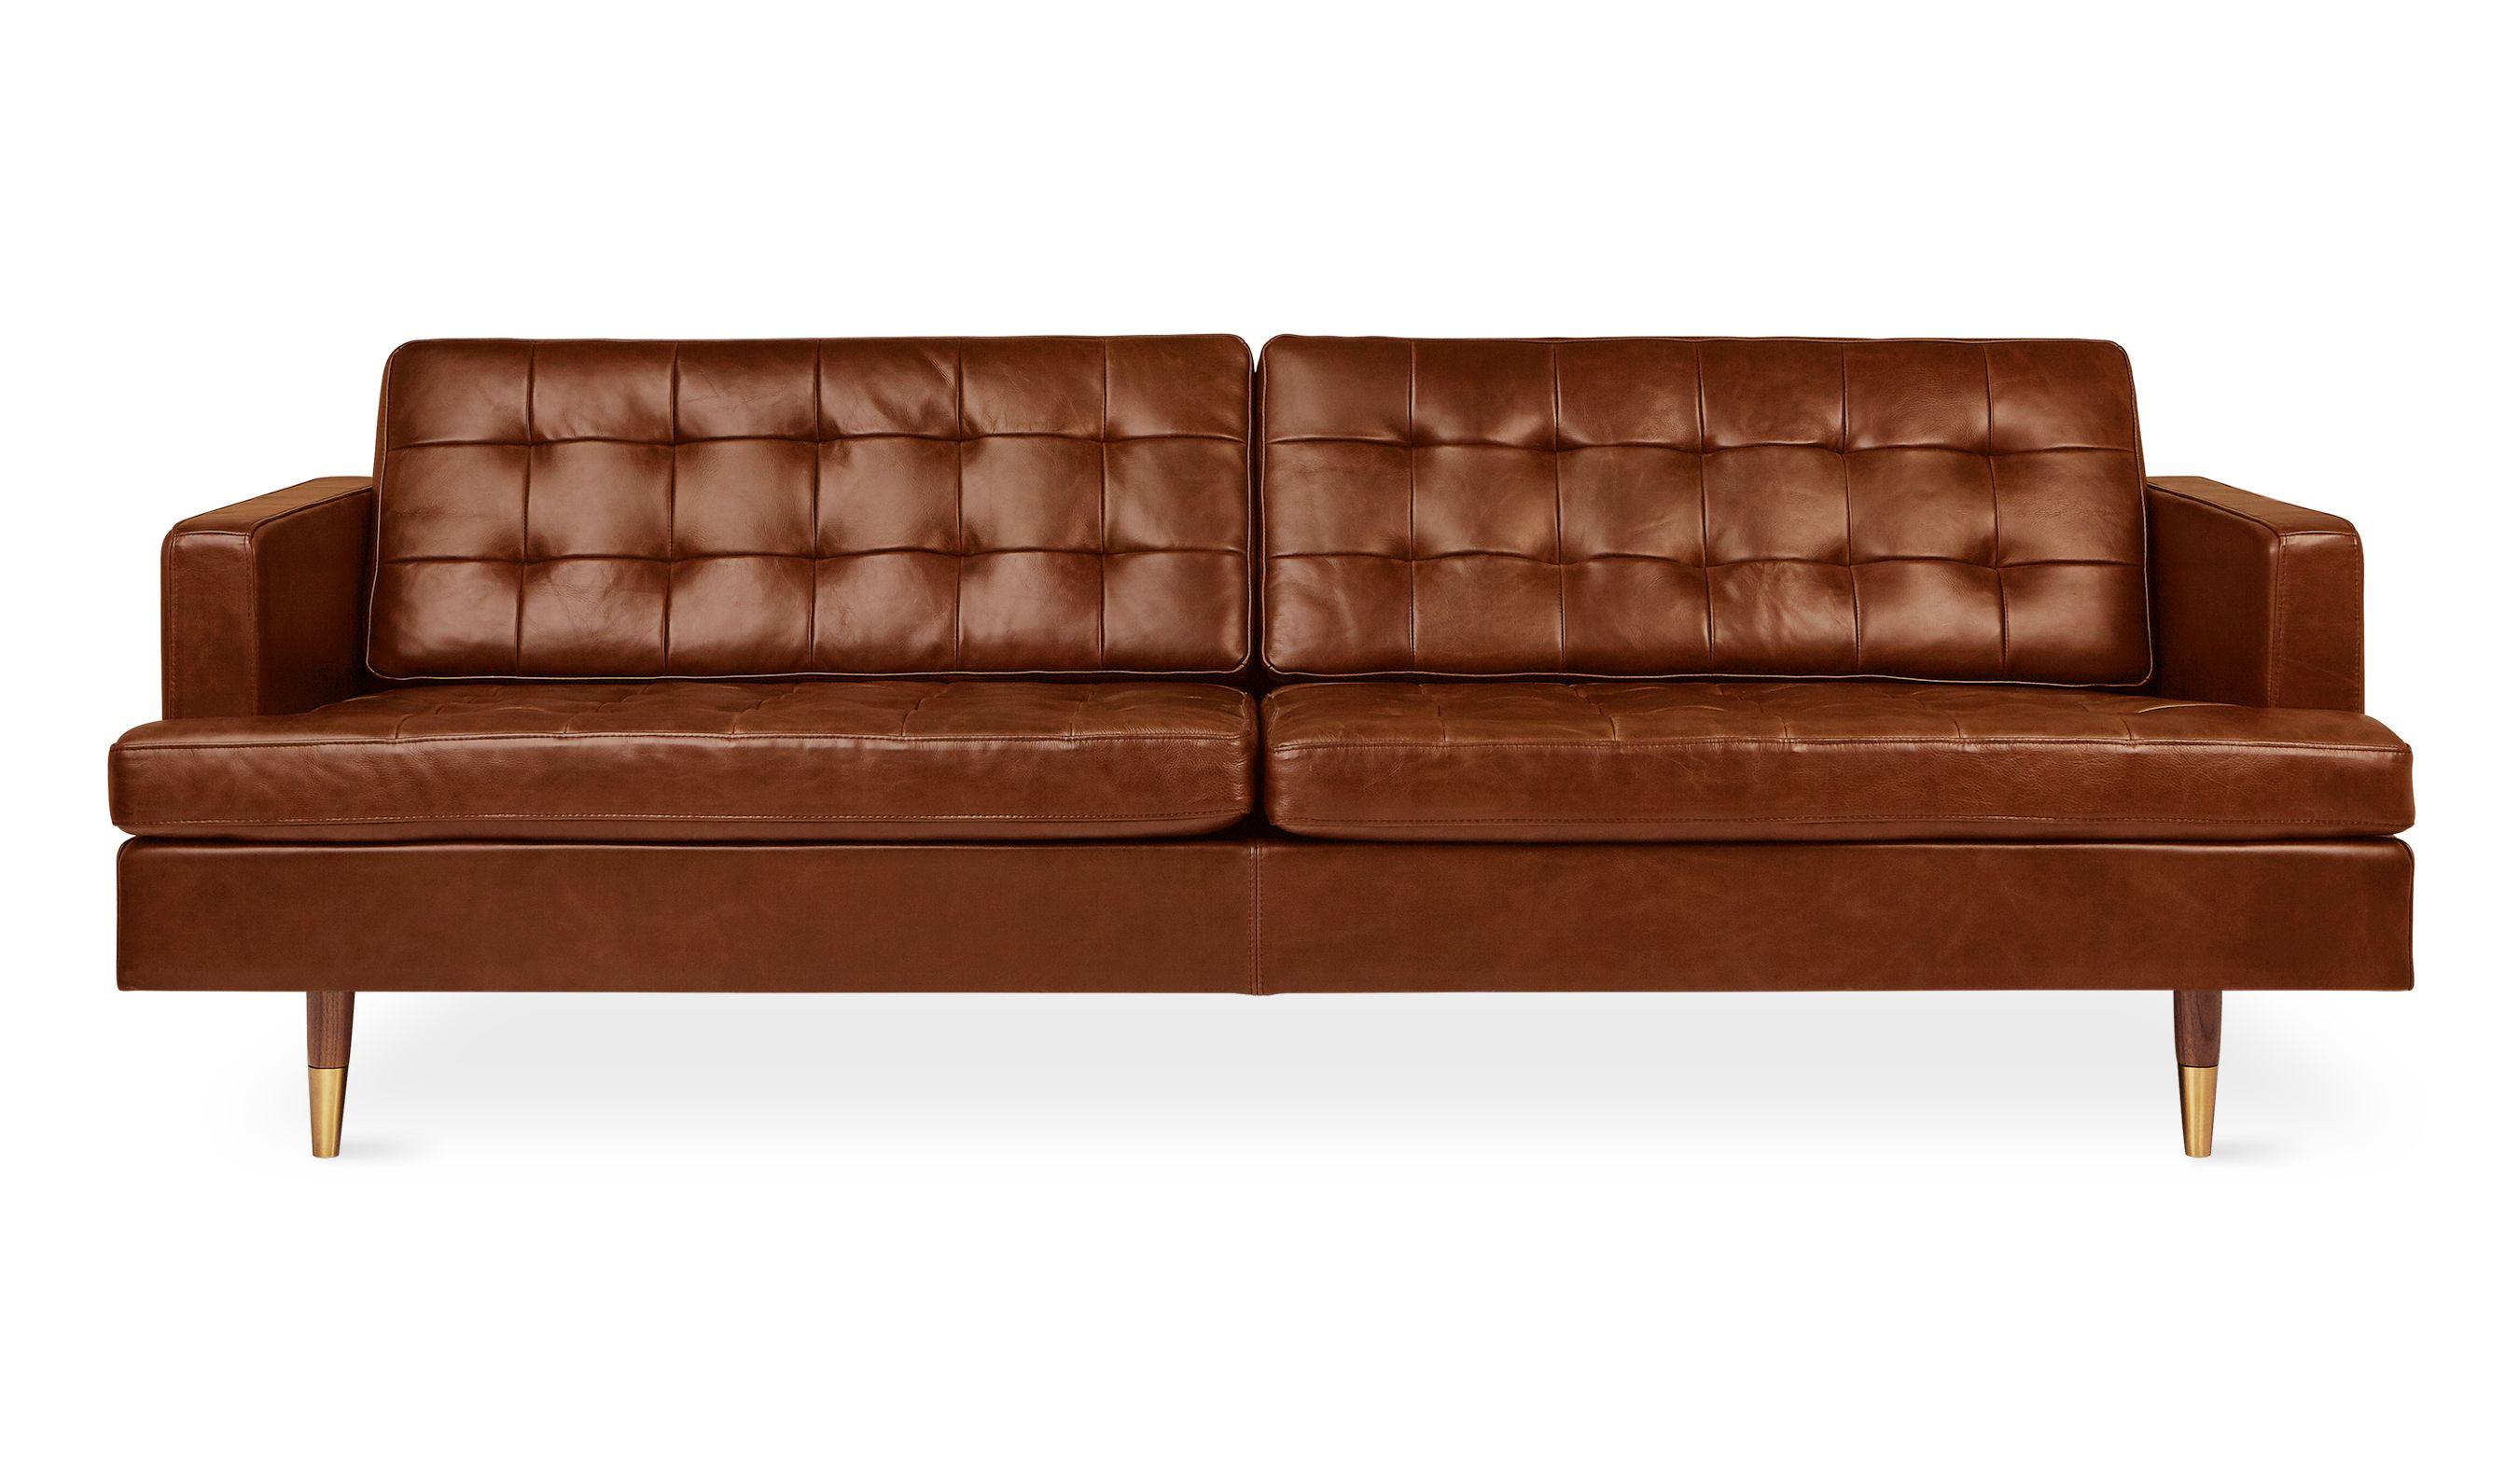 Archer Sofa Sofas Sleepers Gus Modern Brown Living Room Decor Leather Sofa